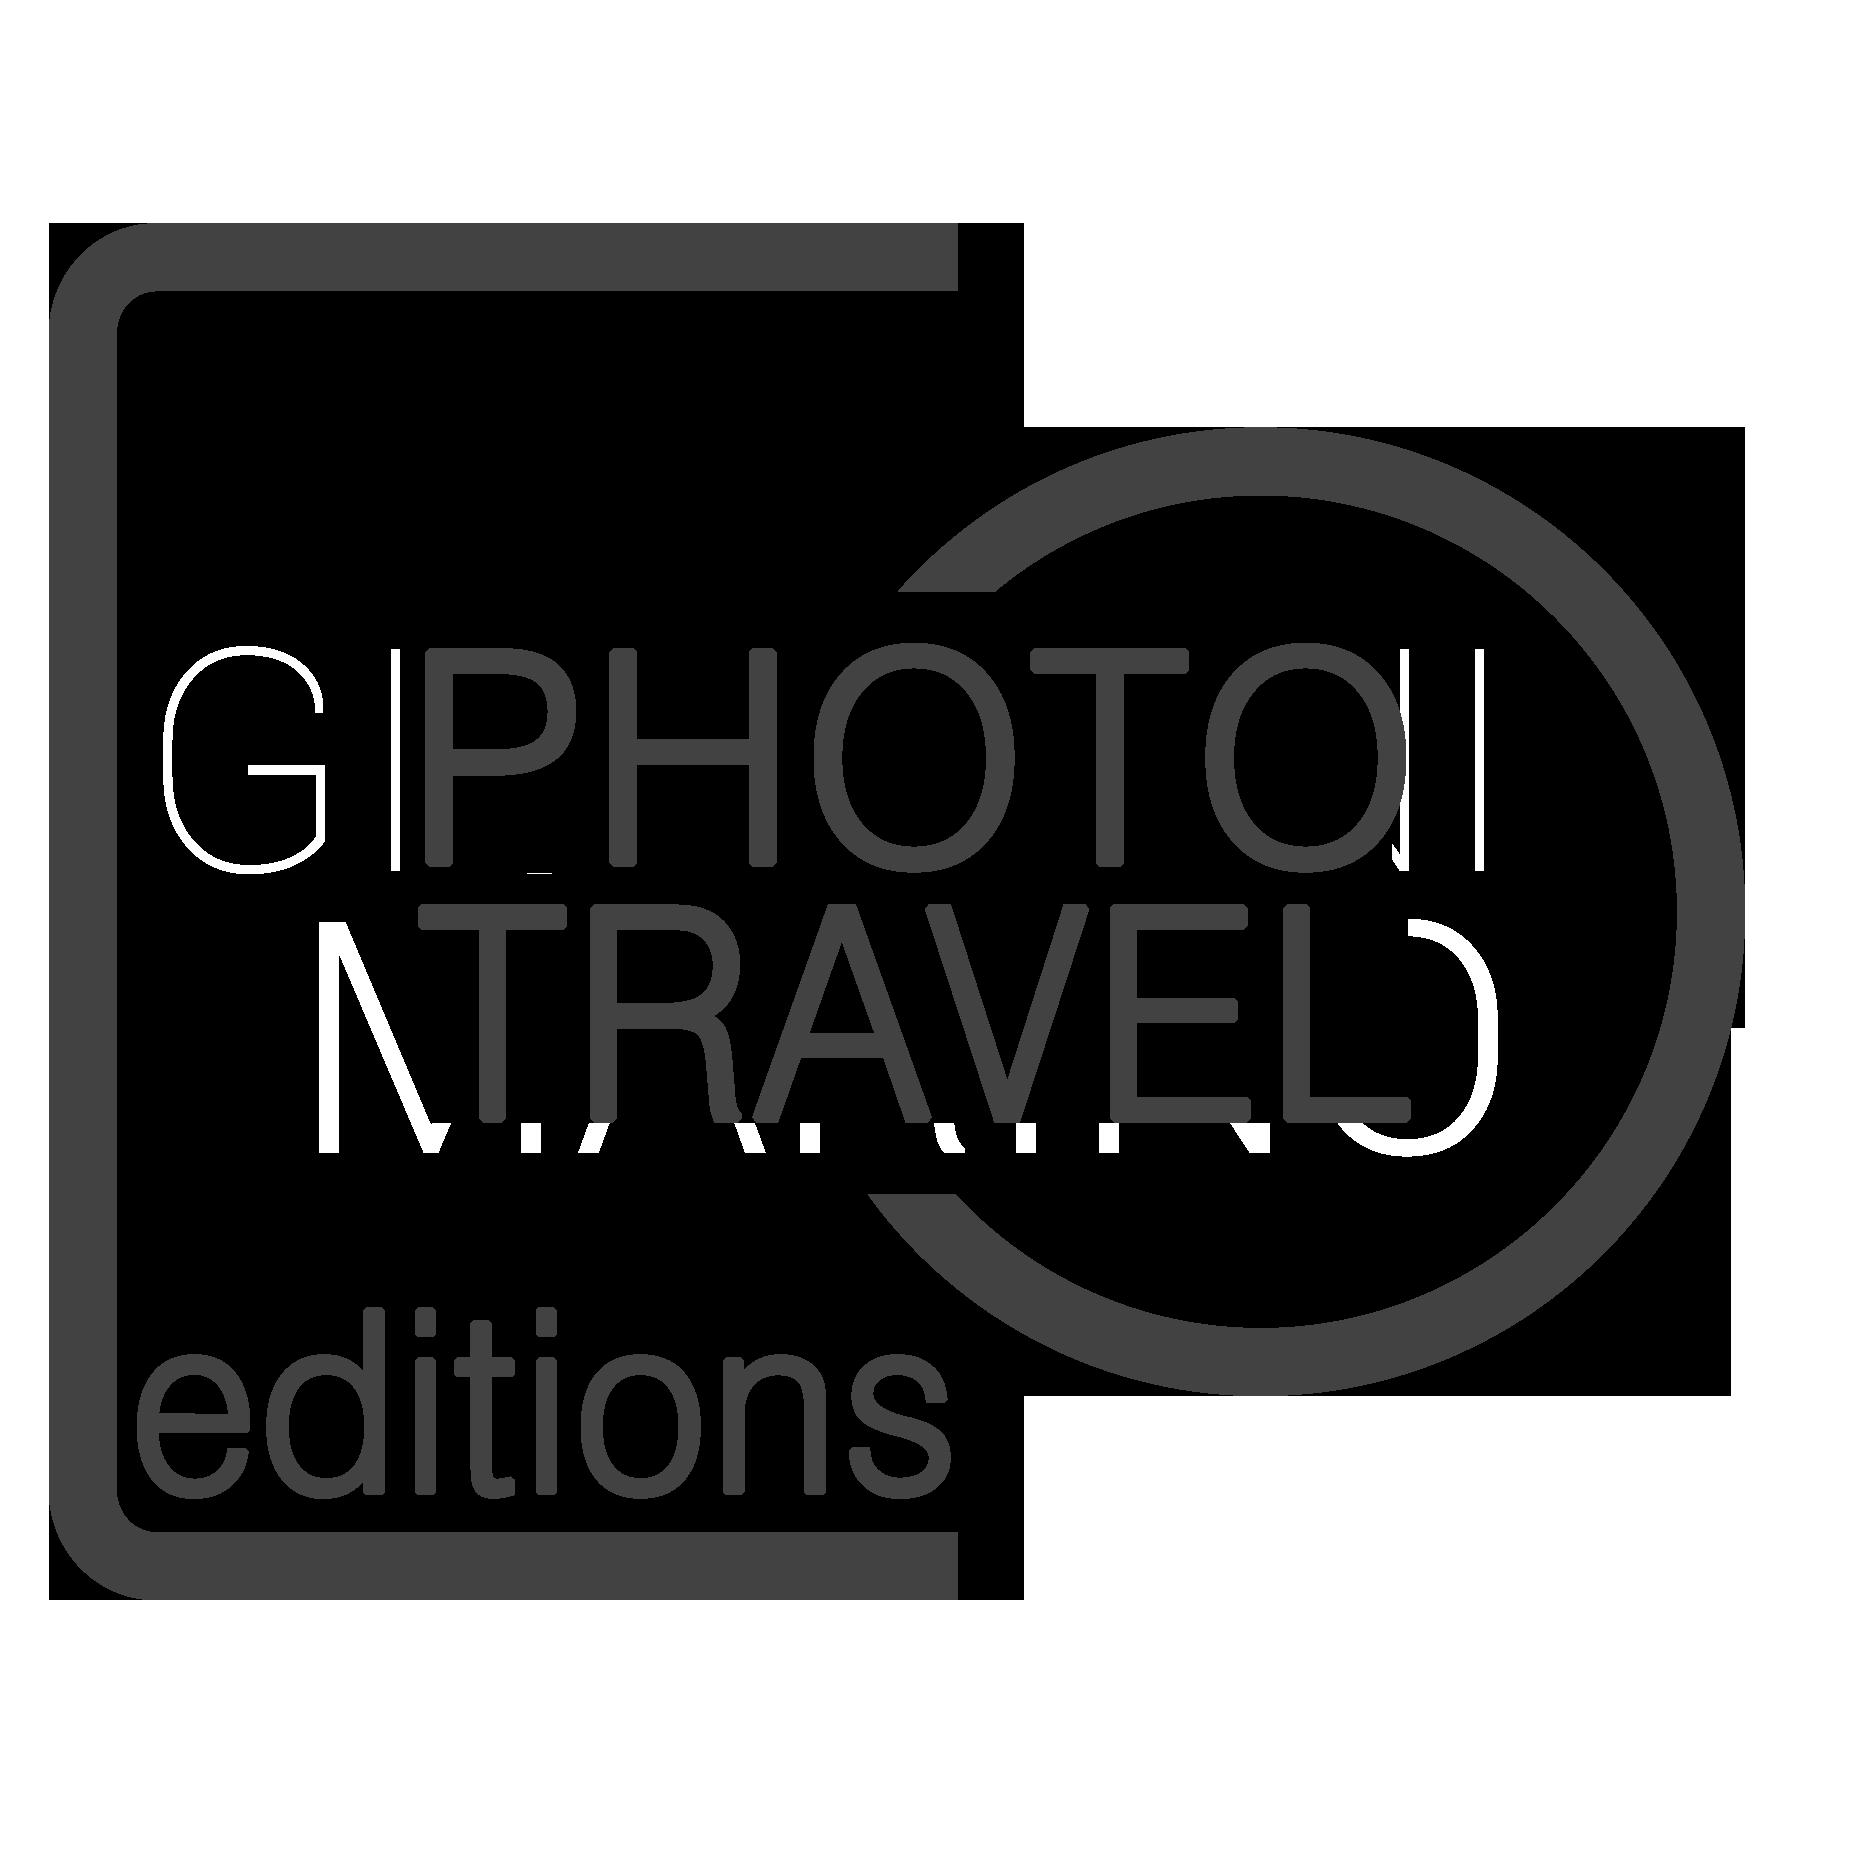 Photo Travel Editions